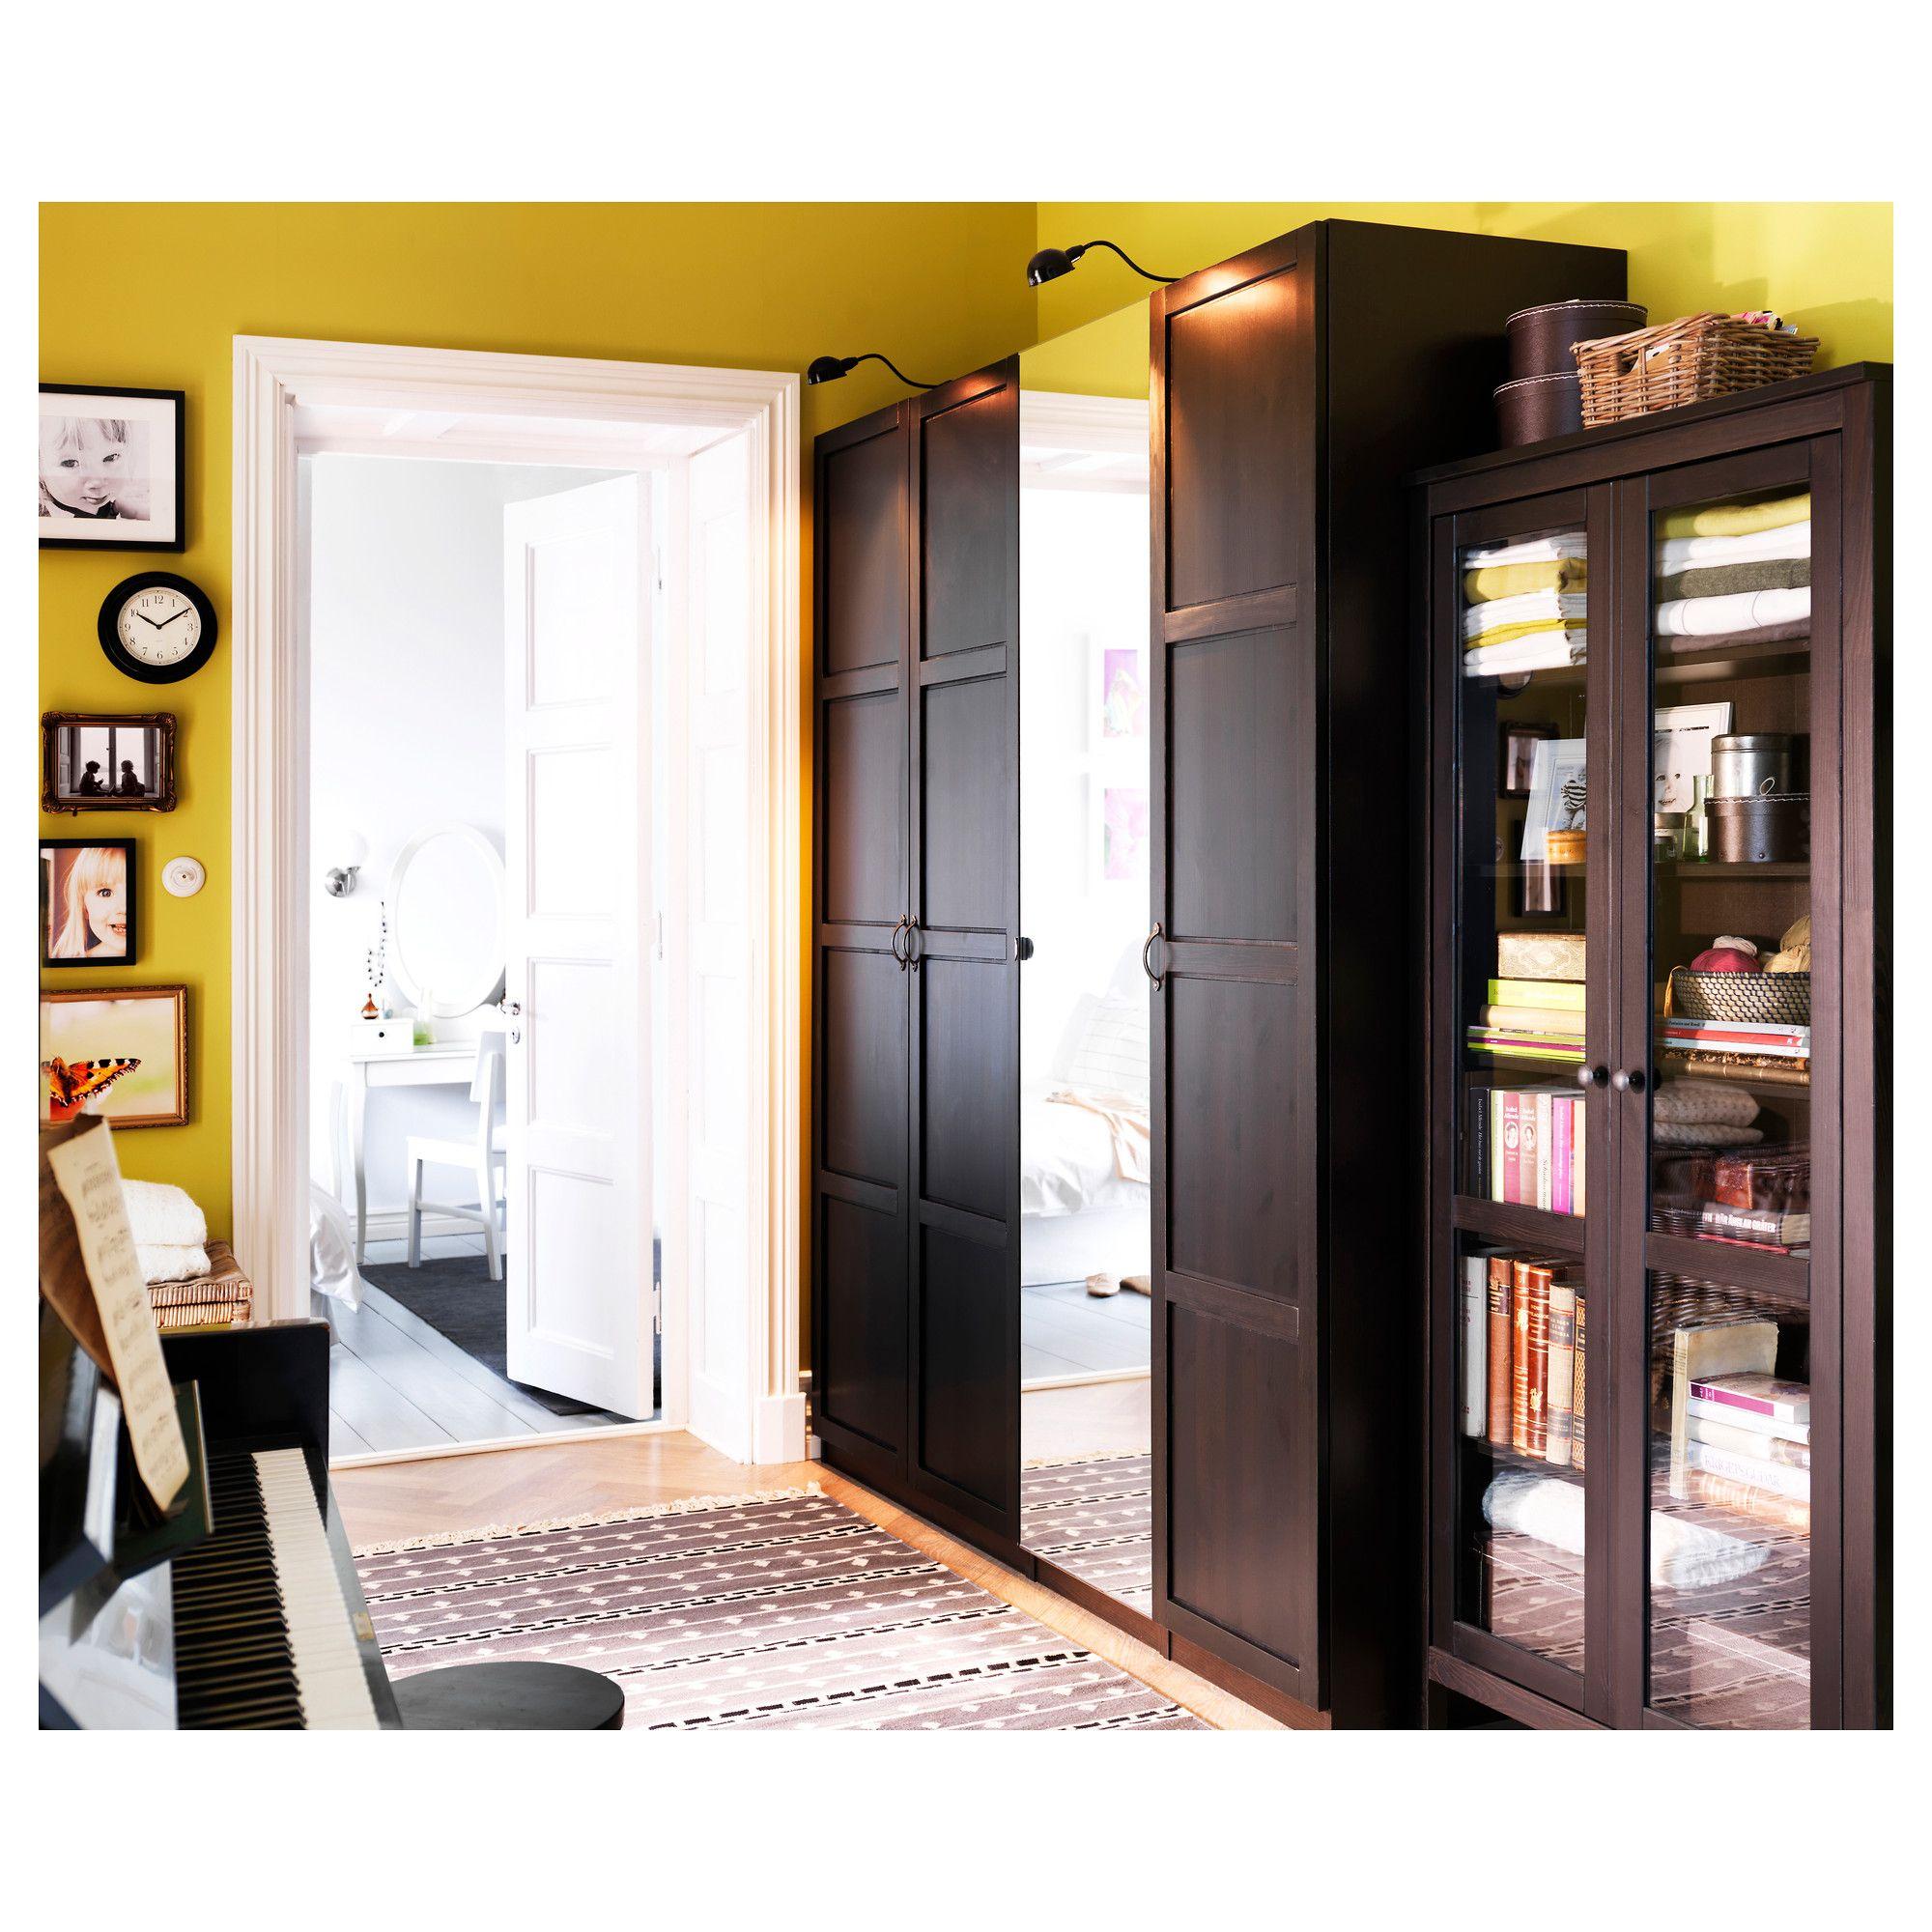 Shop for Furniture, Home Accessories & More Mirror door